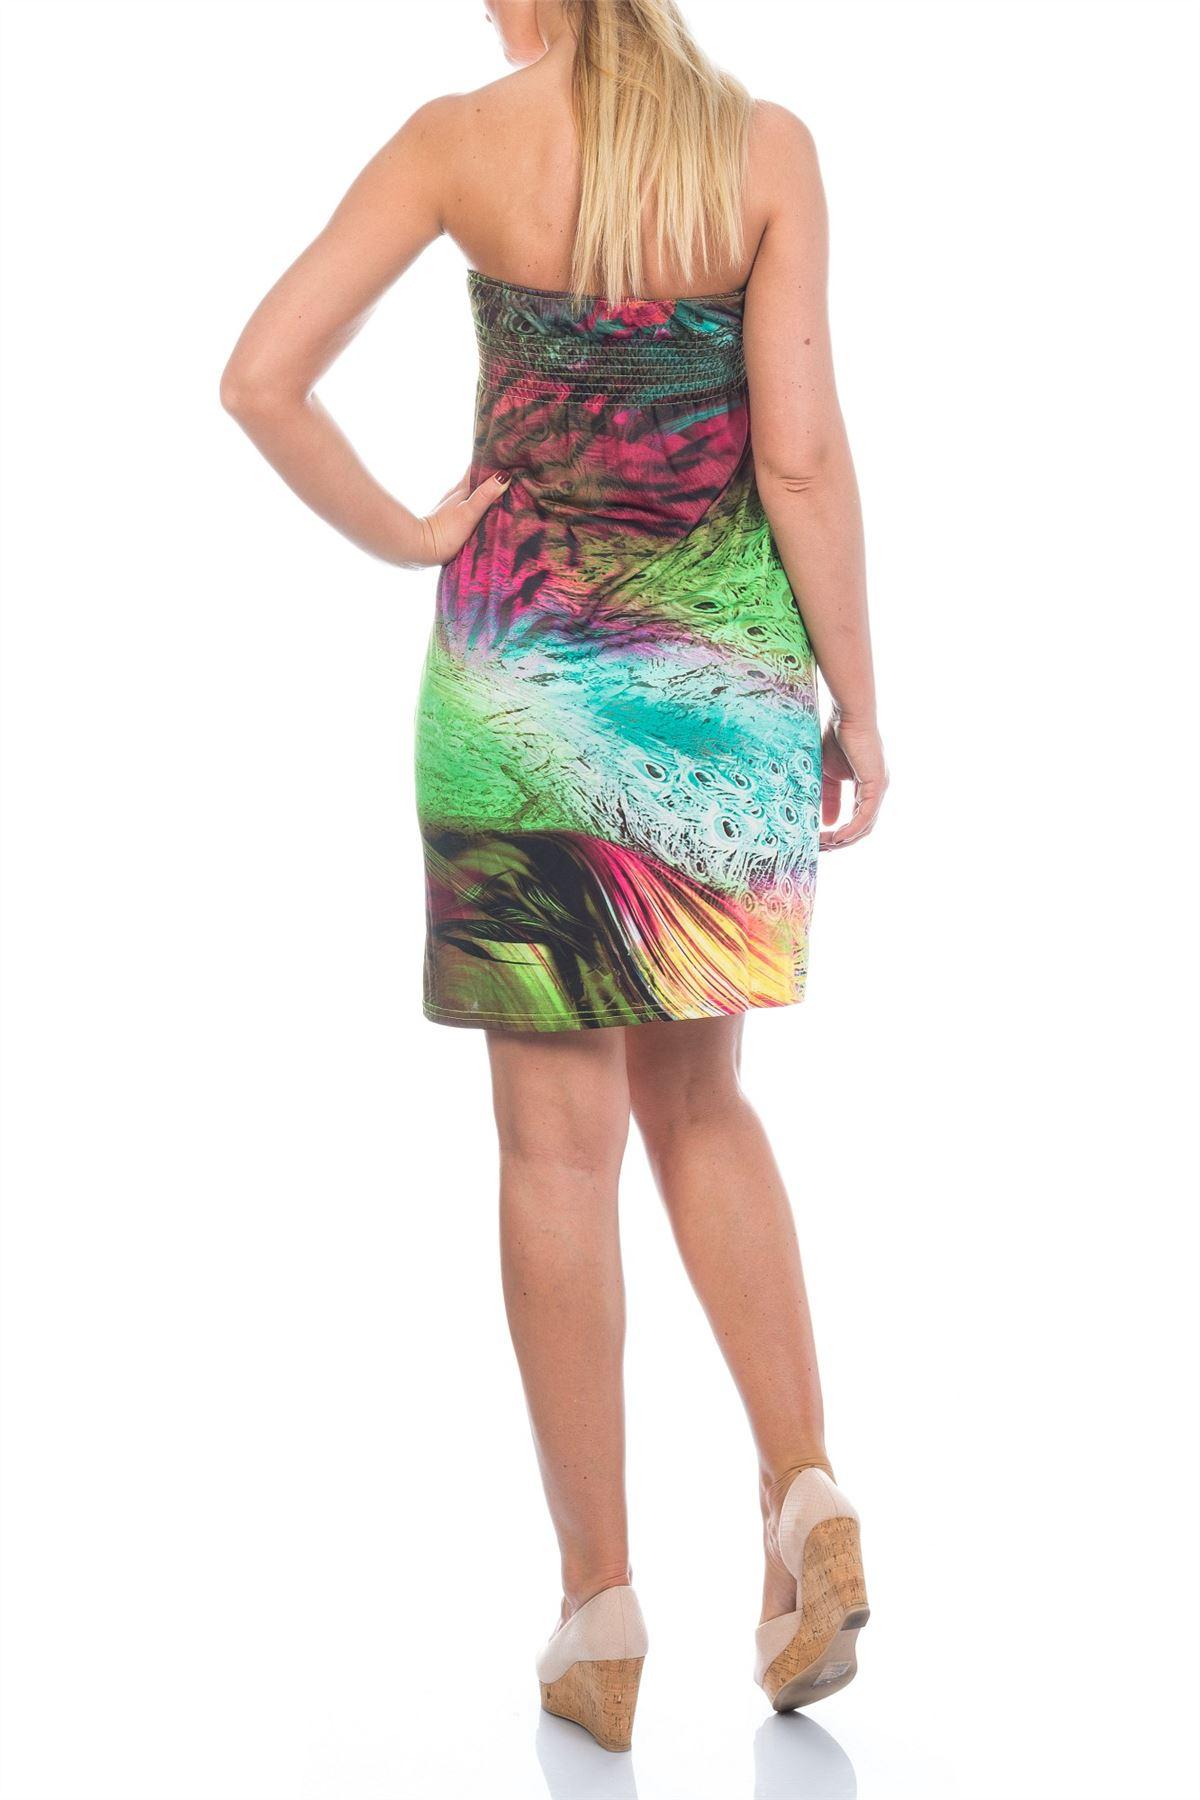 Martildo Womens Tropical Short Holiday Summer Sundress ... - photo#41